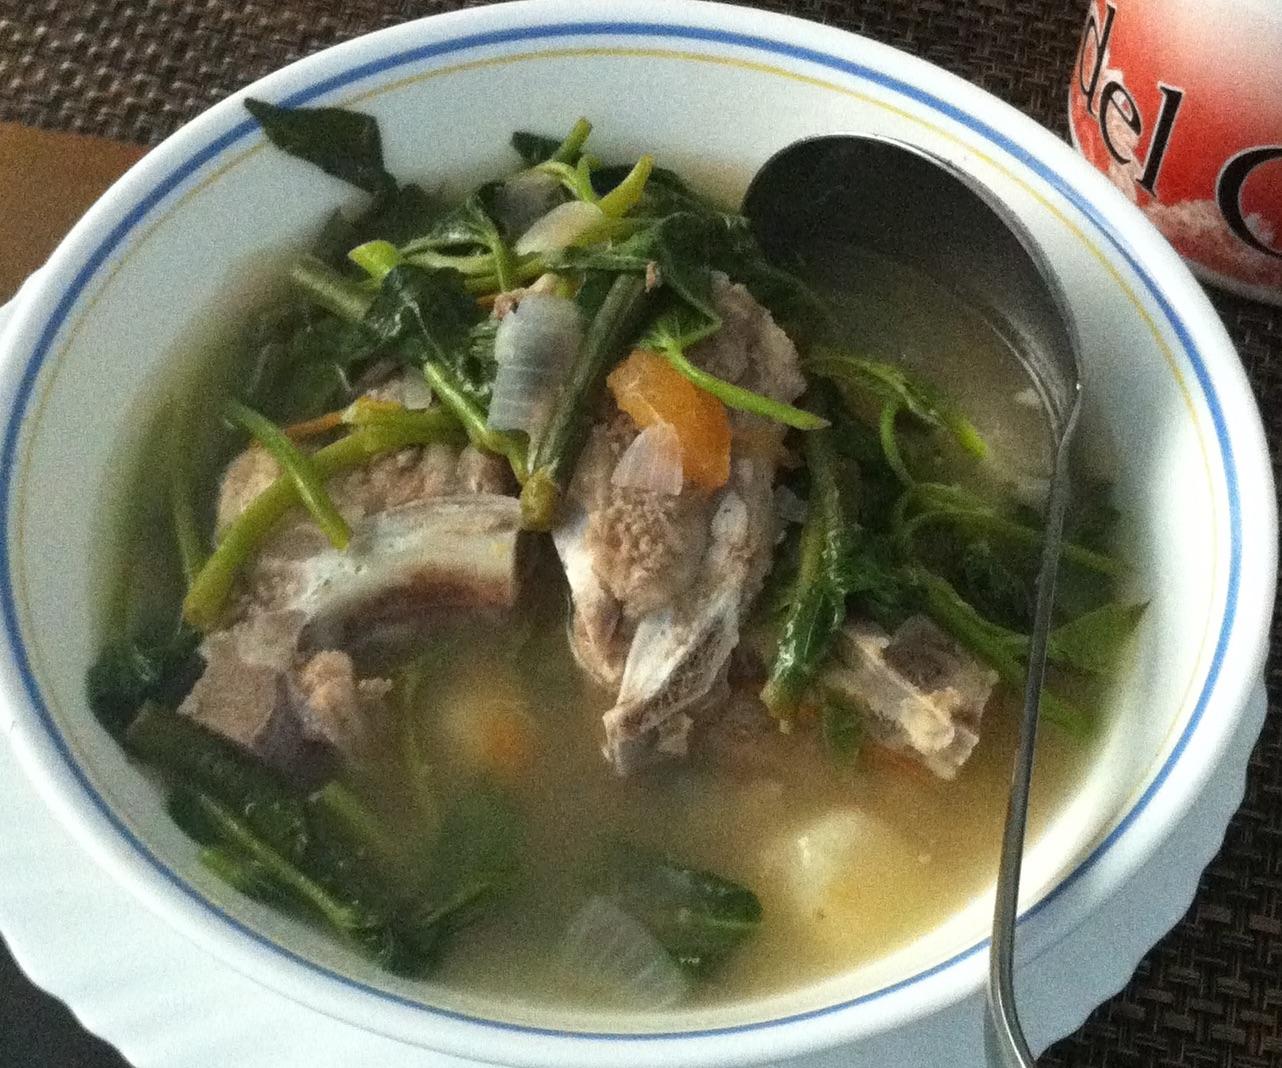 Sinigang: the ubiquitoussour tamarind soup, a Filipino classic.